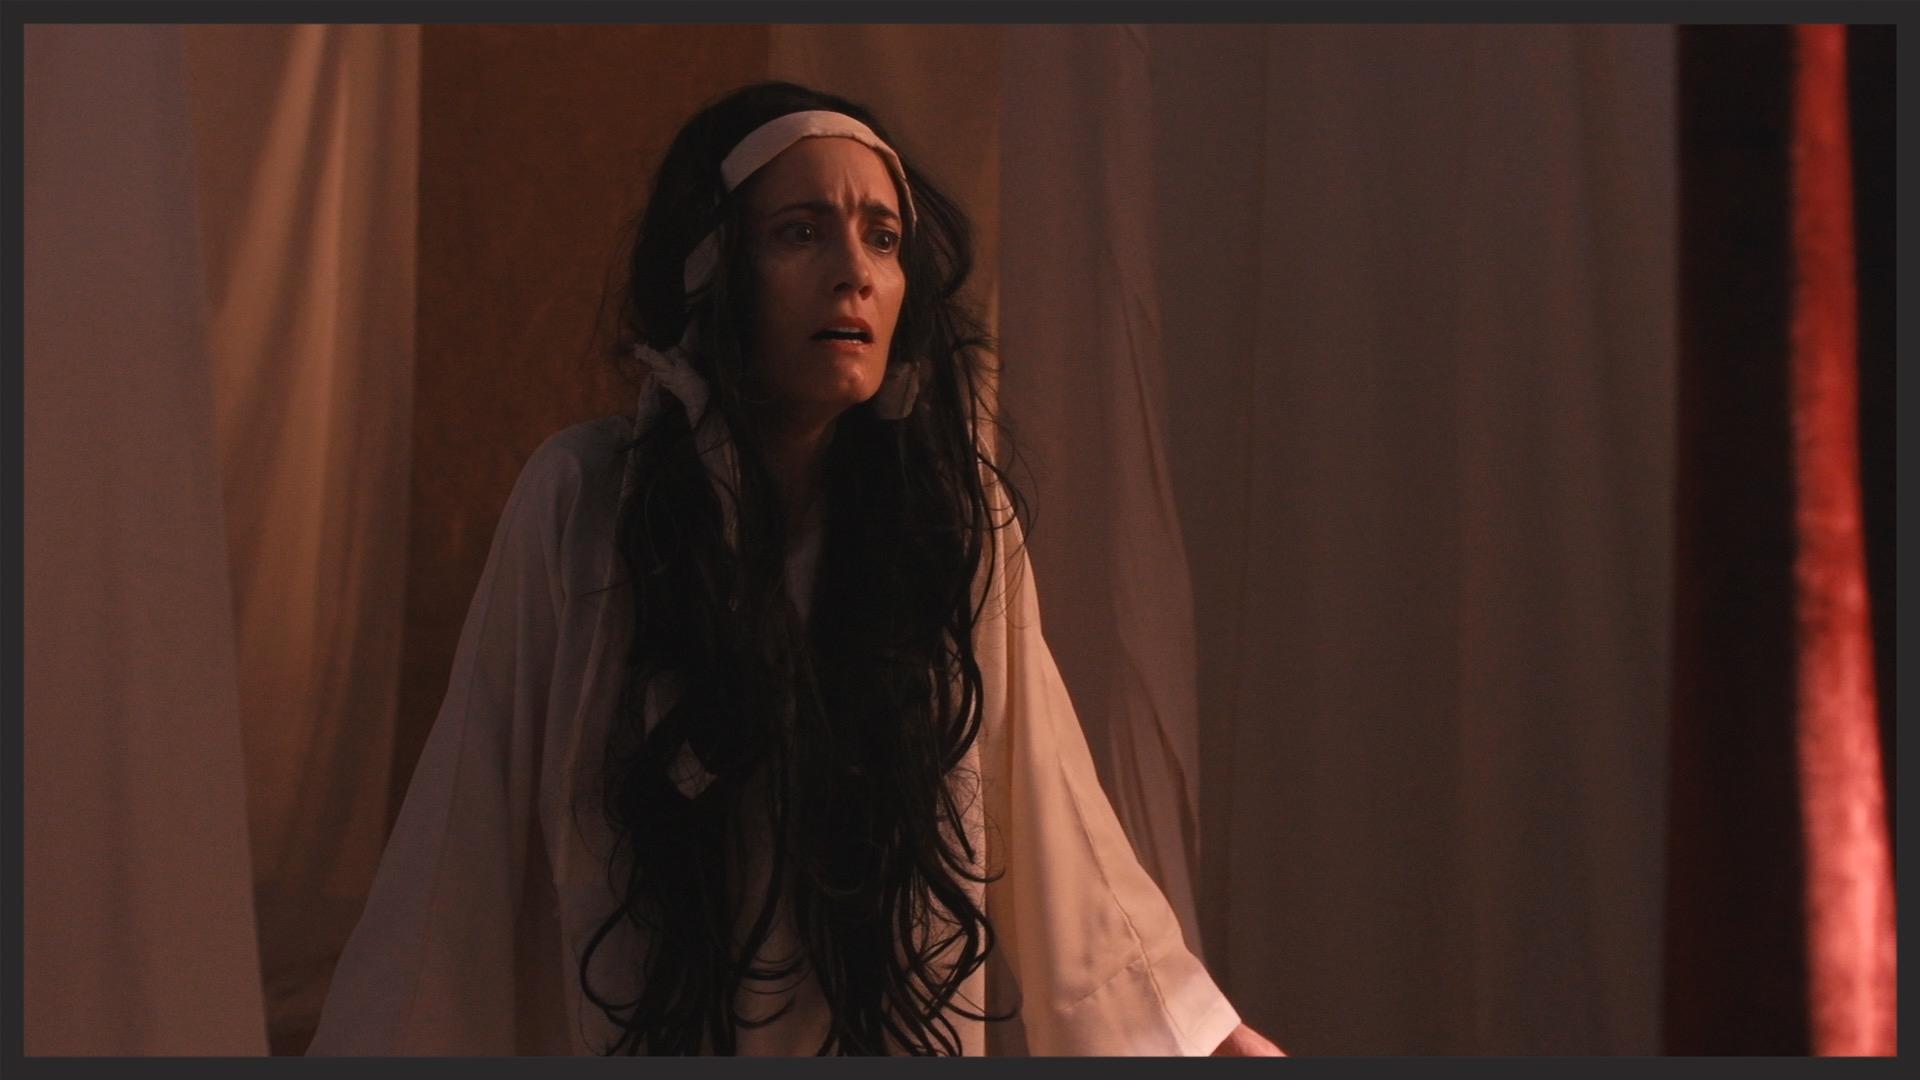 Coralina Cataldi-Tassoni as Lady Macbeth